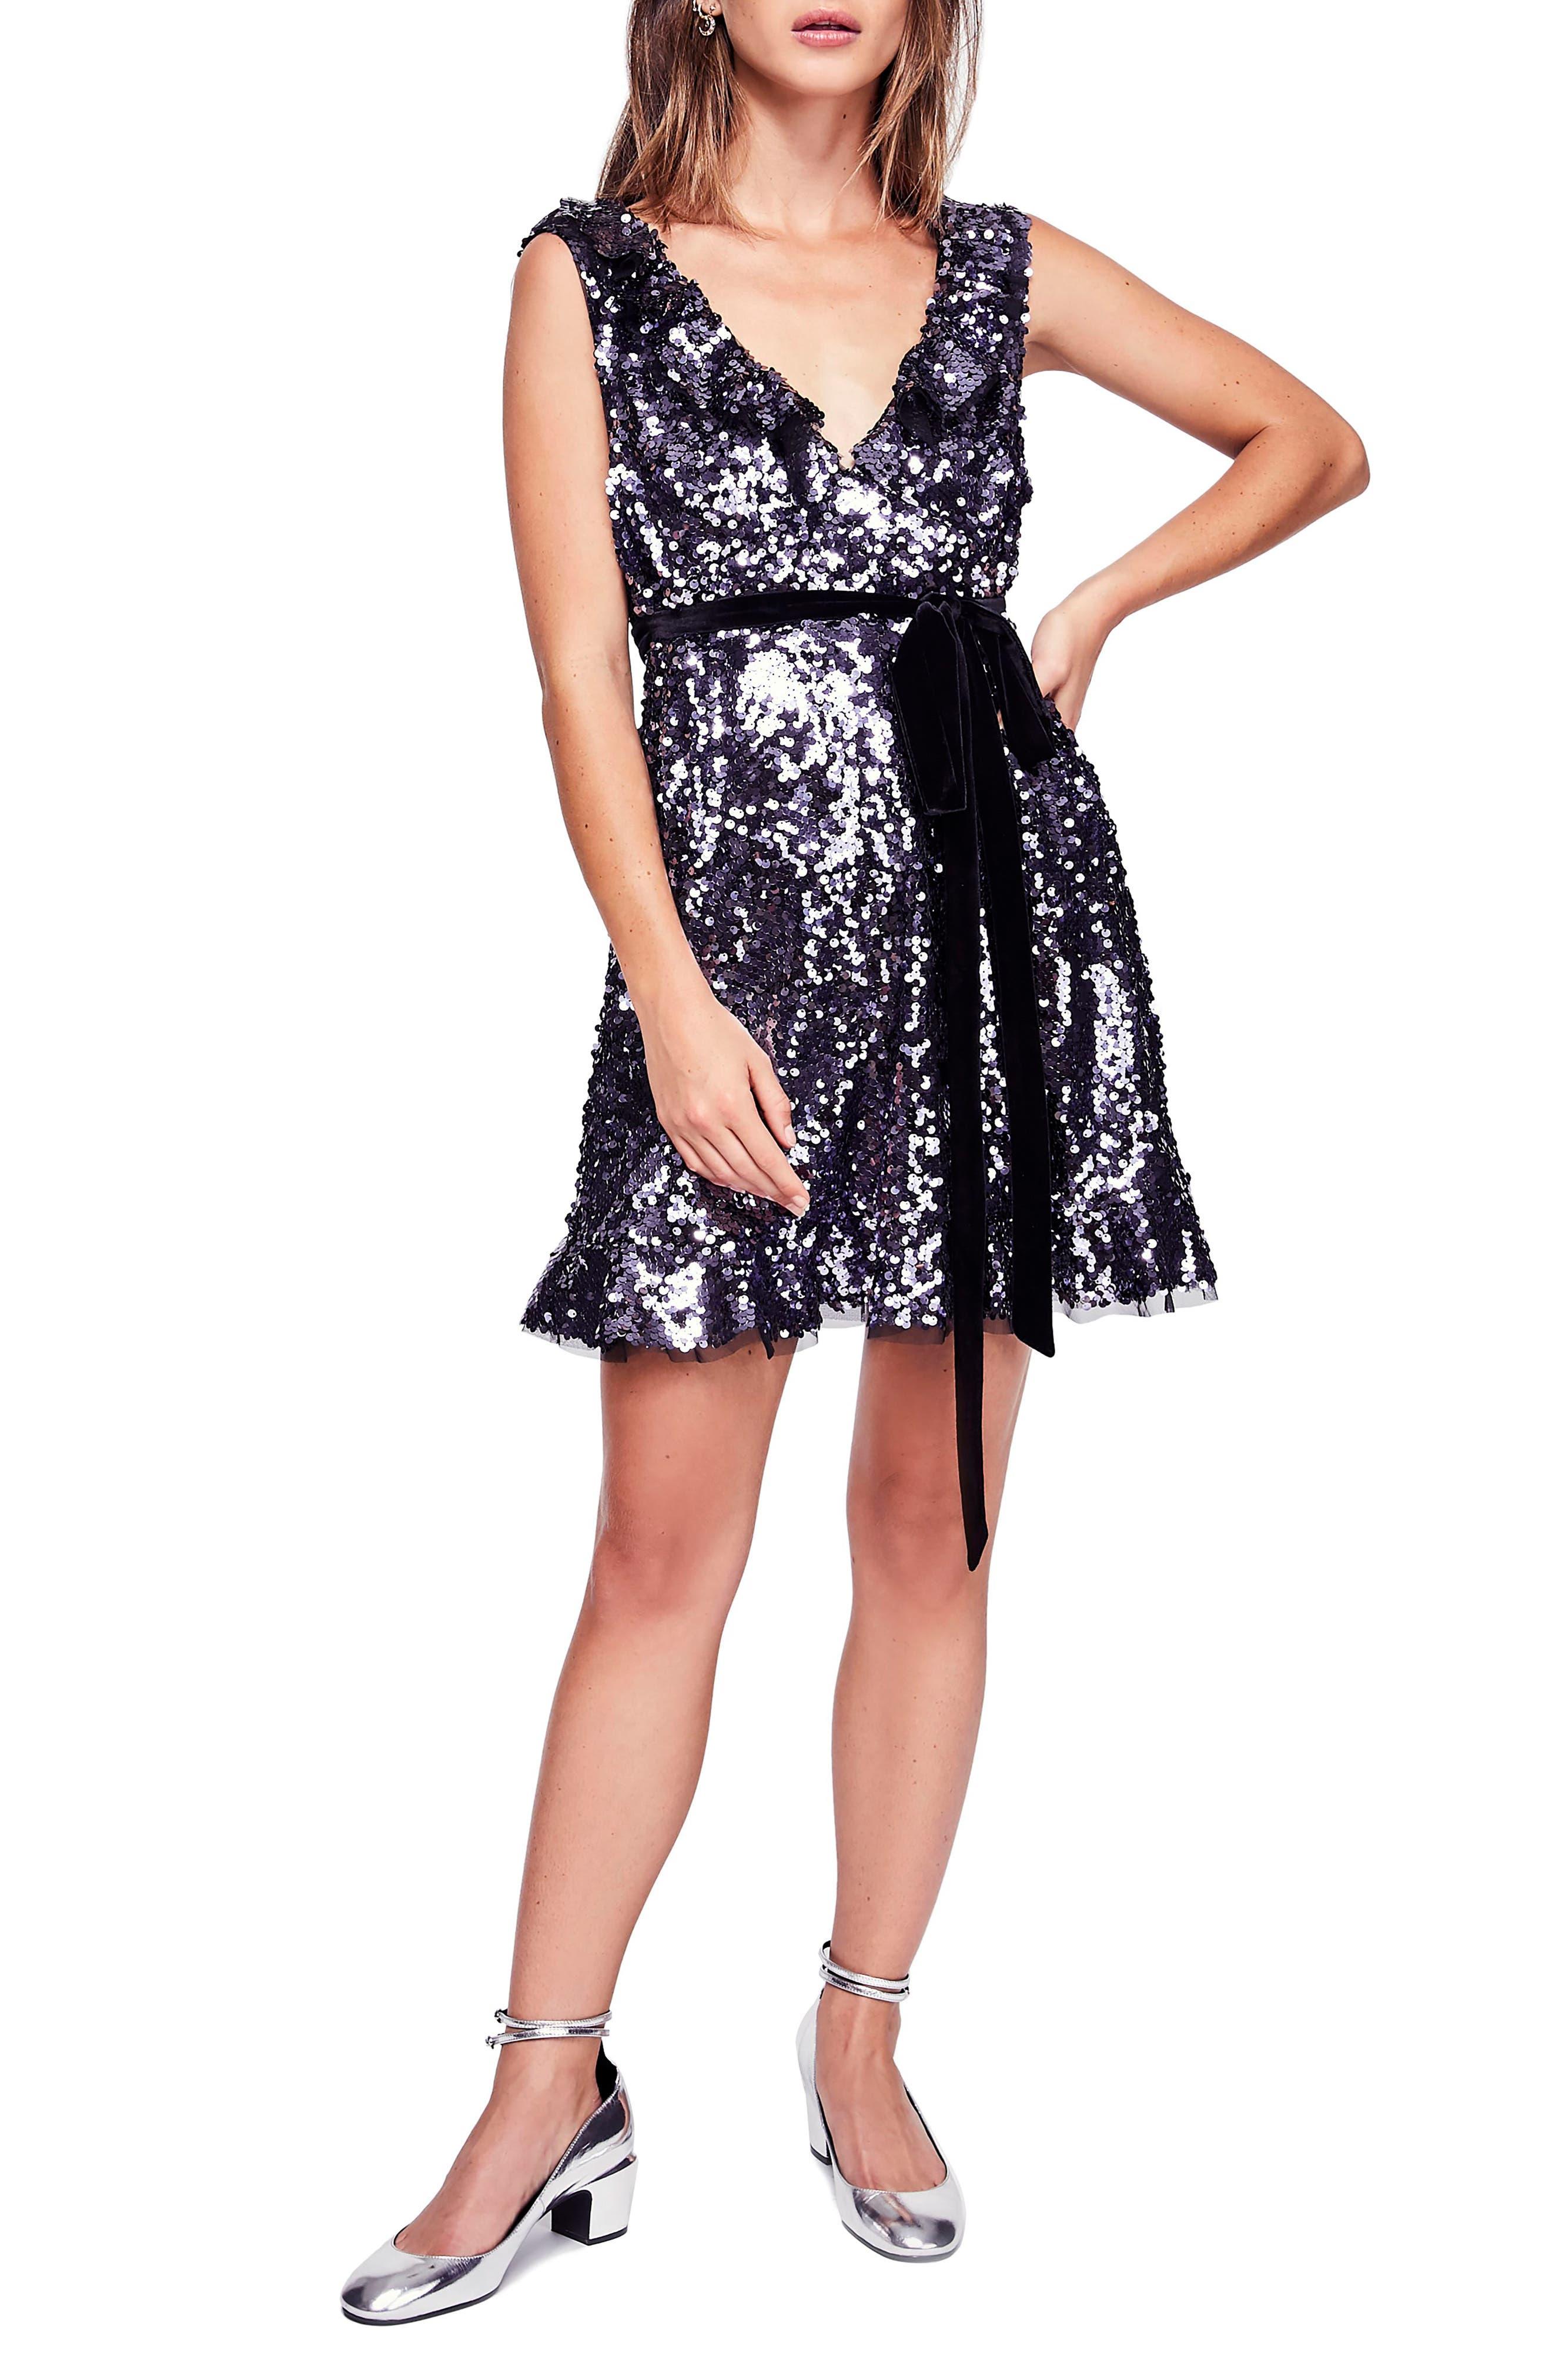 Siren Sequin Dress,                             Main thumbnail 1, color,                             BLACK